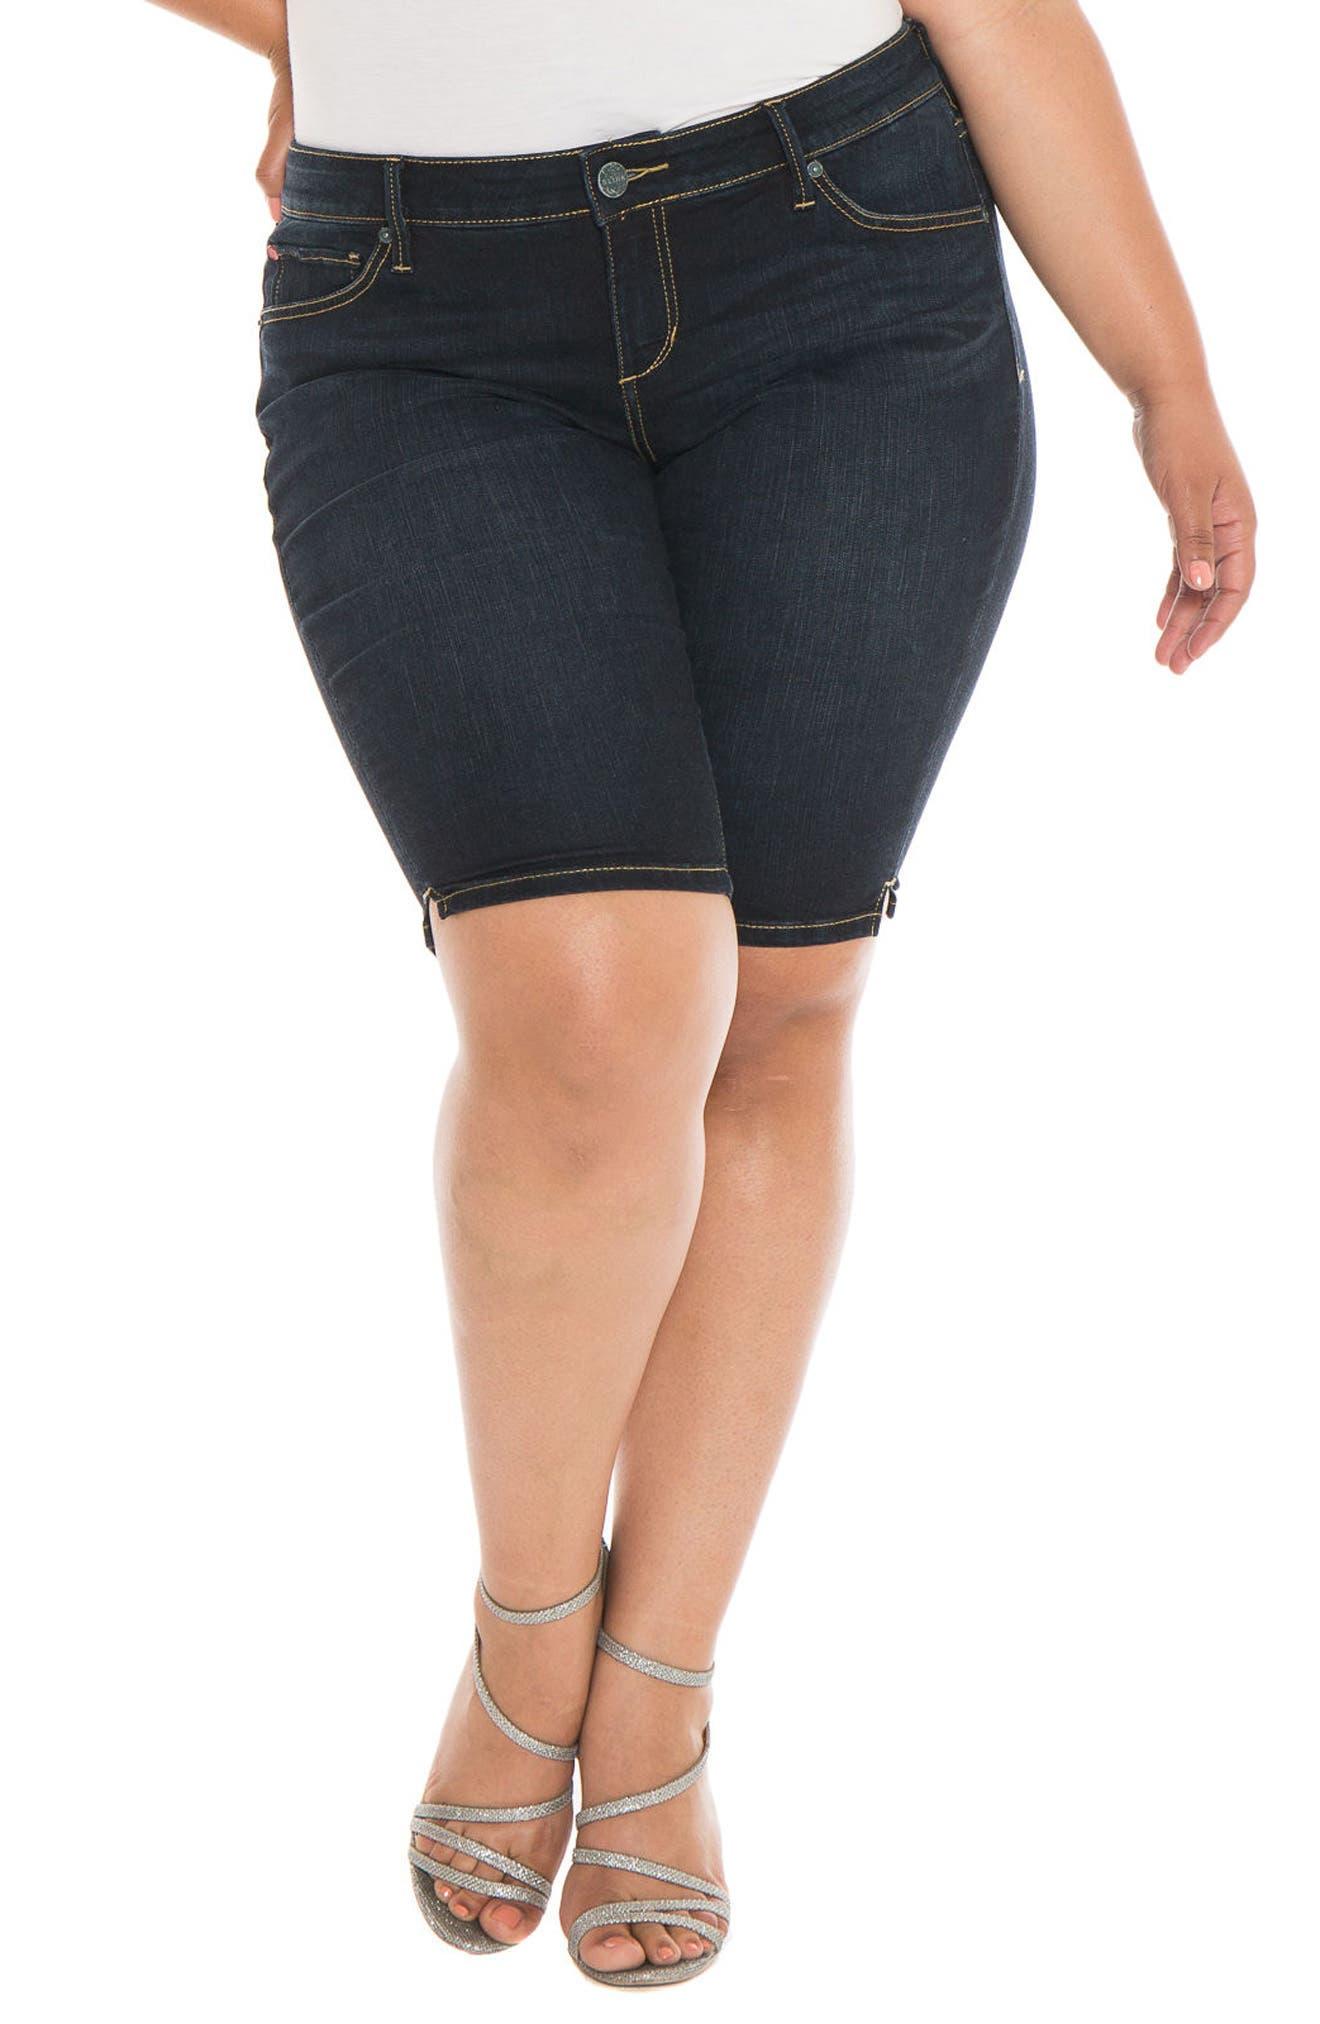 Main Image - SLINK Jeans Stretch Denim Bermuda Shorts (Summer) (Plus Size)